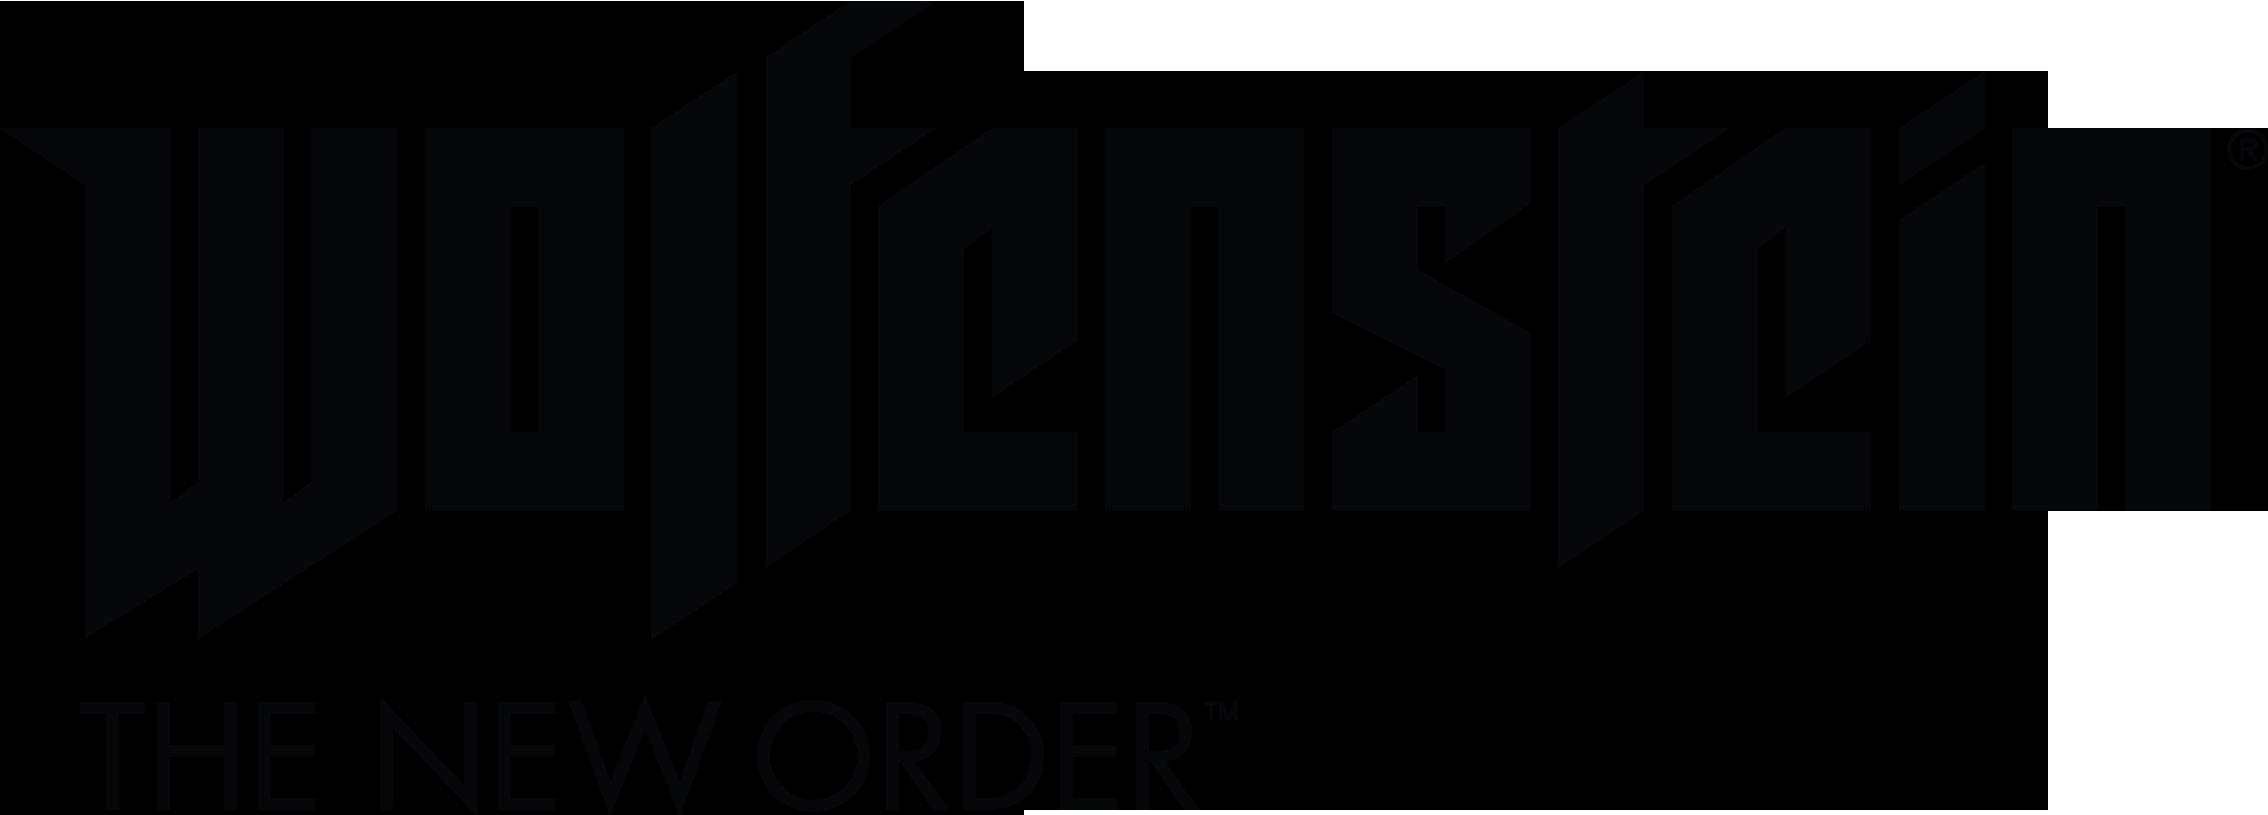 Wolfenstein The New Order Machine Man Clear The Room